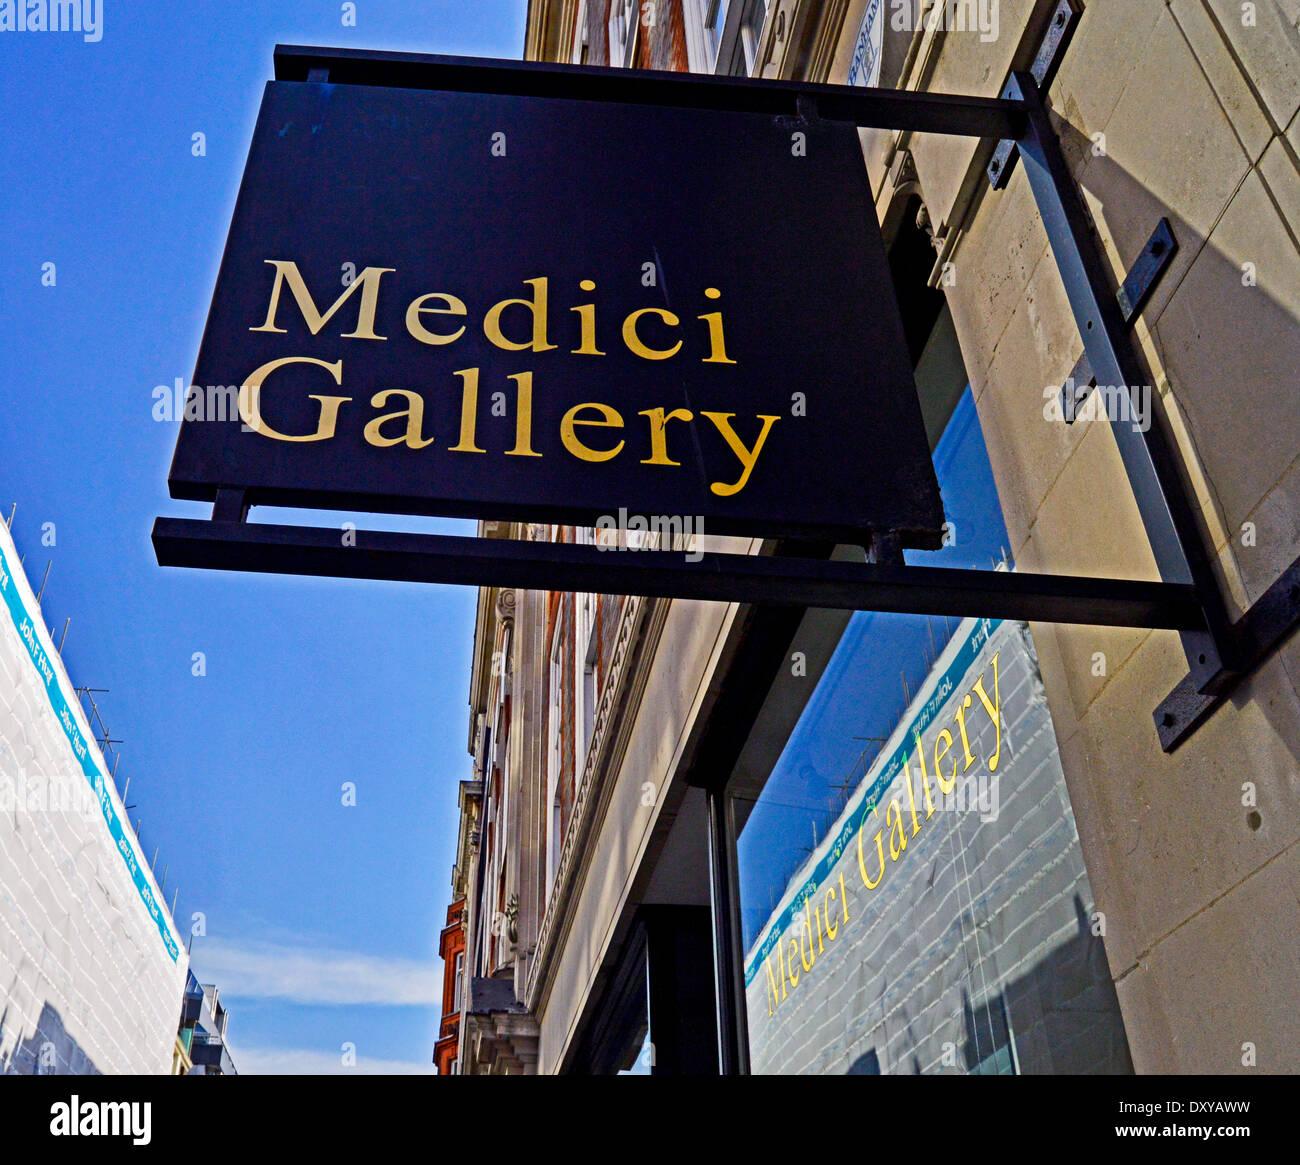 The Medici gallery on Cork Street, Mayfair, London, England, United Kingdom - Stock Image